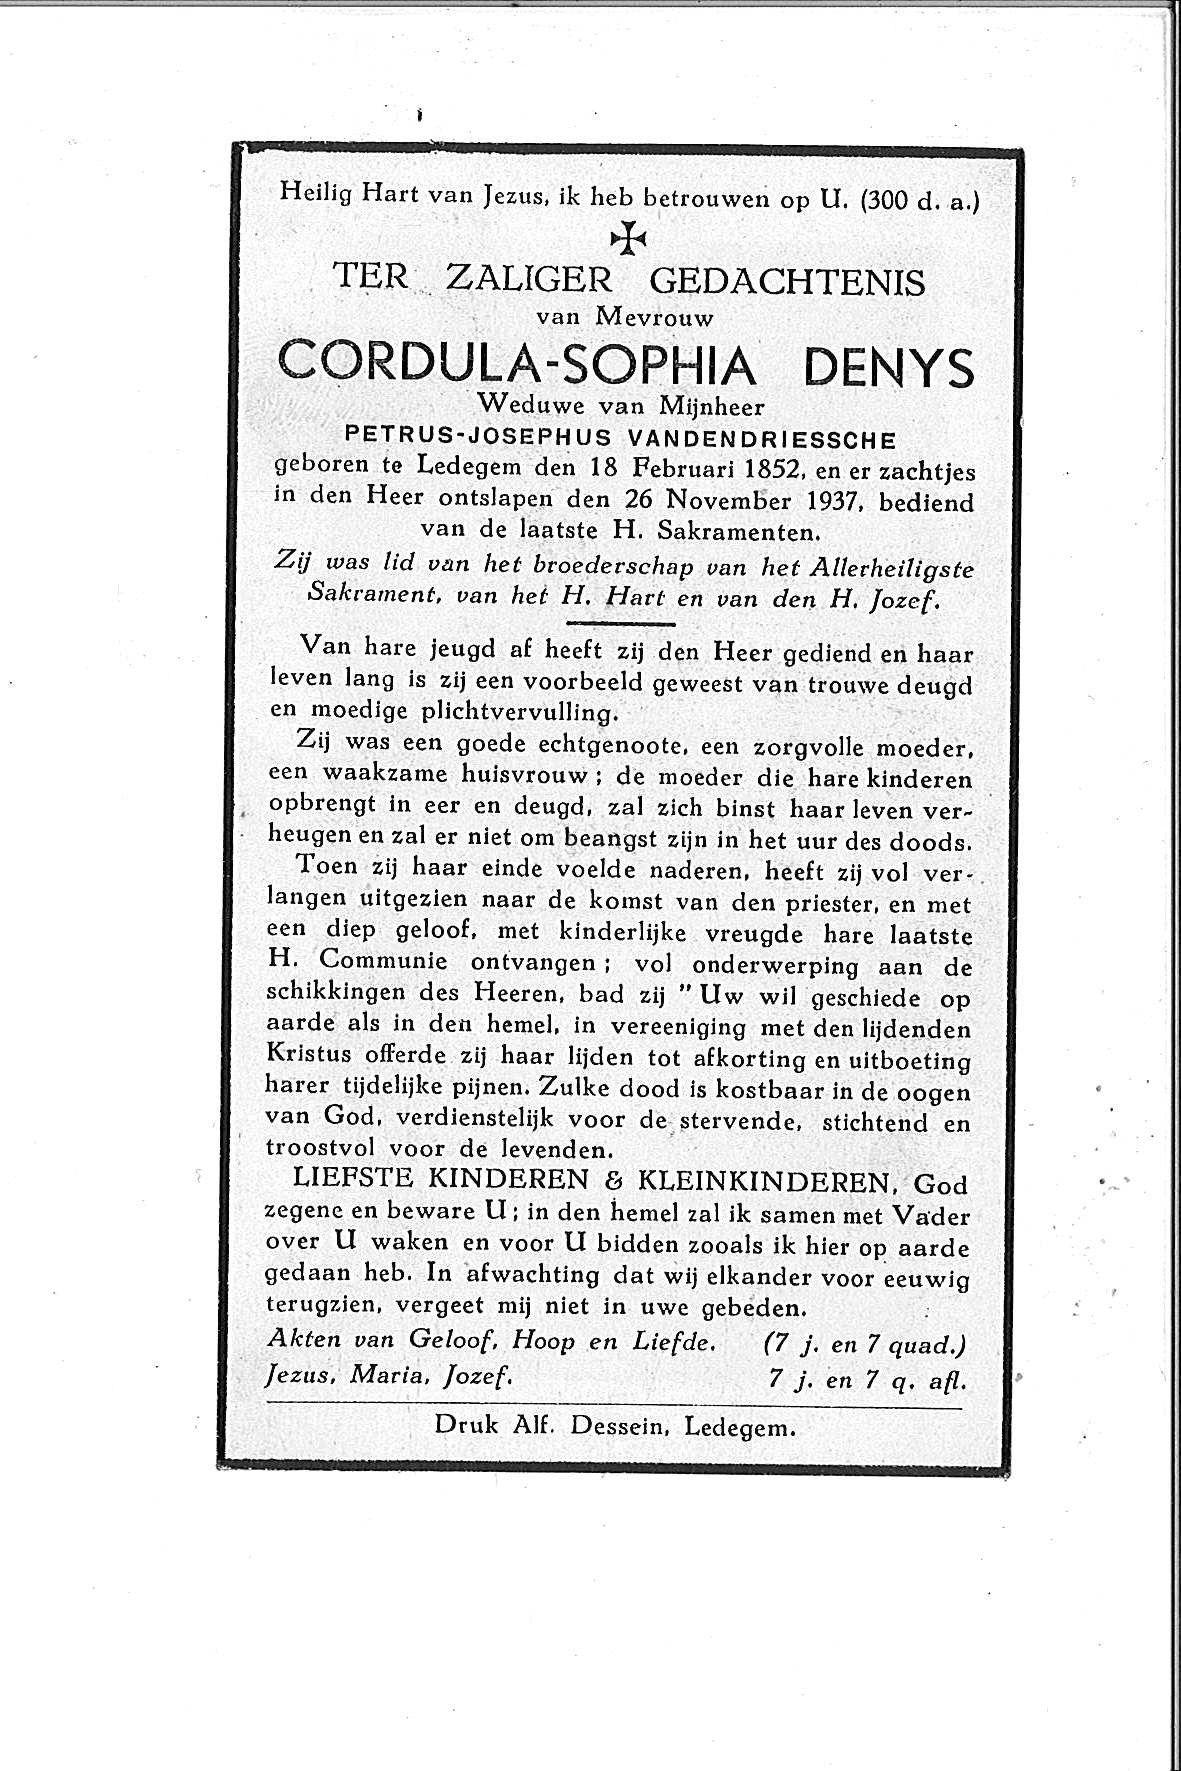 Cordula-Sophia(1937)20150409150401_00032.jpg